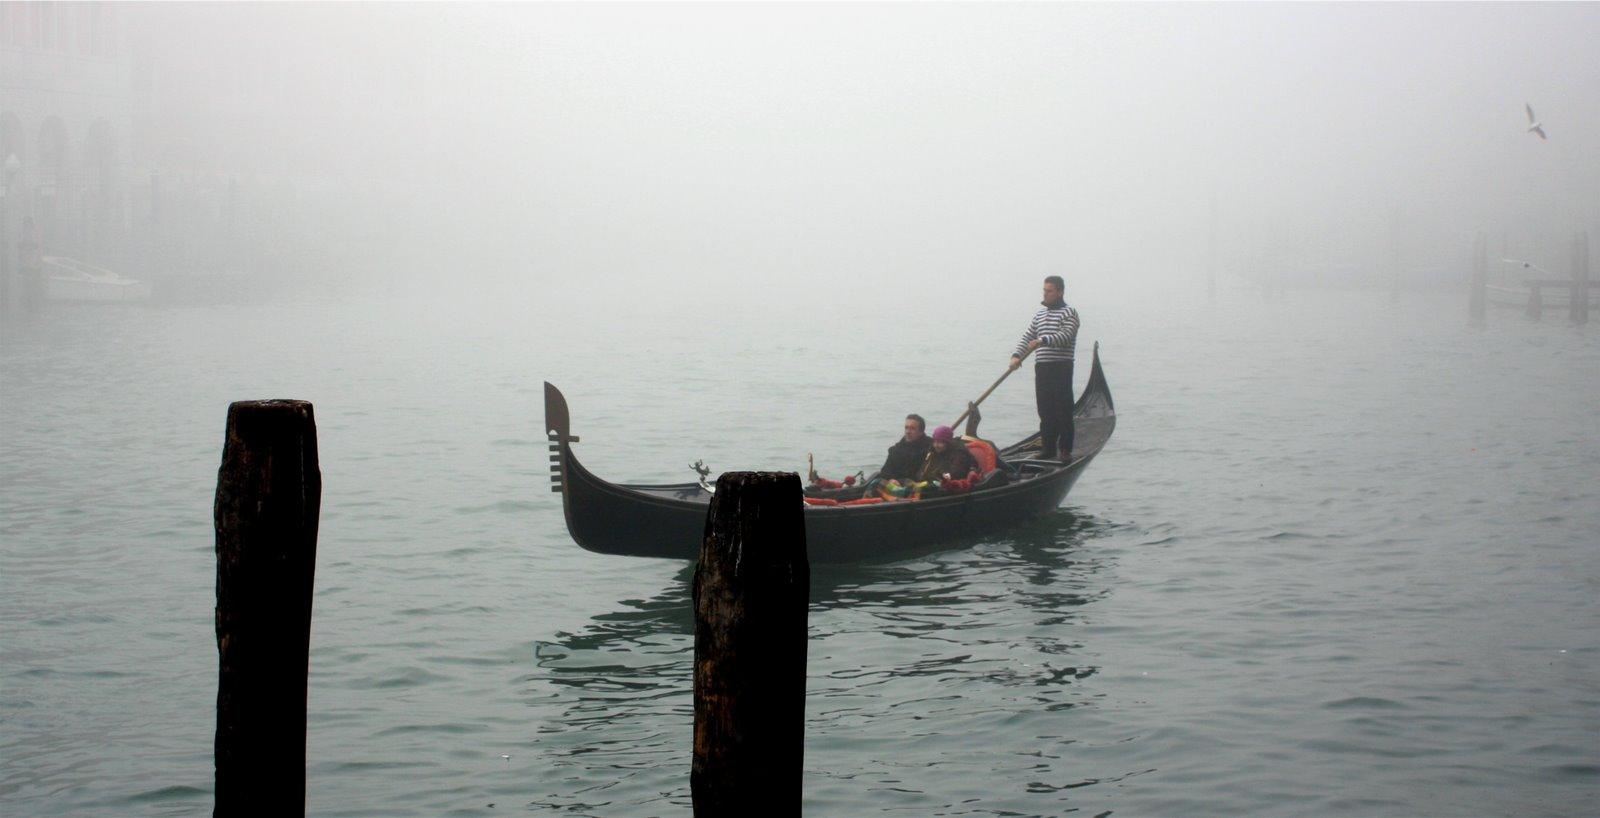 [gondola_ride_in_fog.jpg]